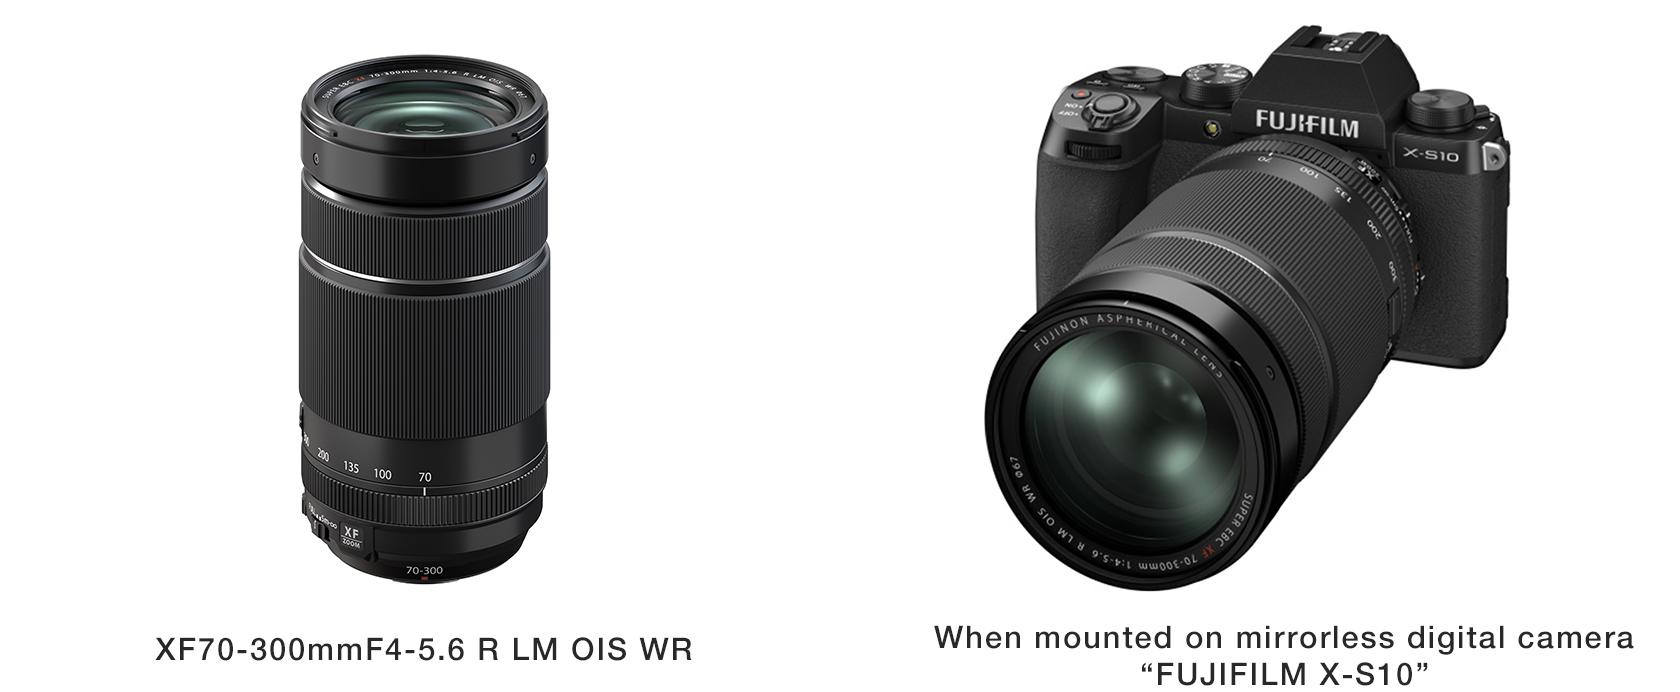 [Image]XF70-300mmF4-5.6 R LM OIS WR